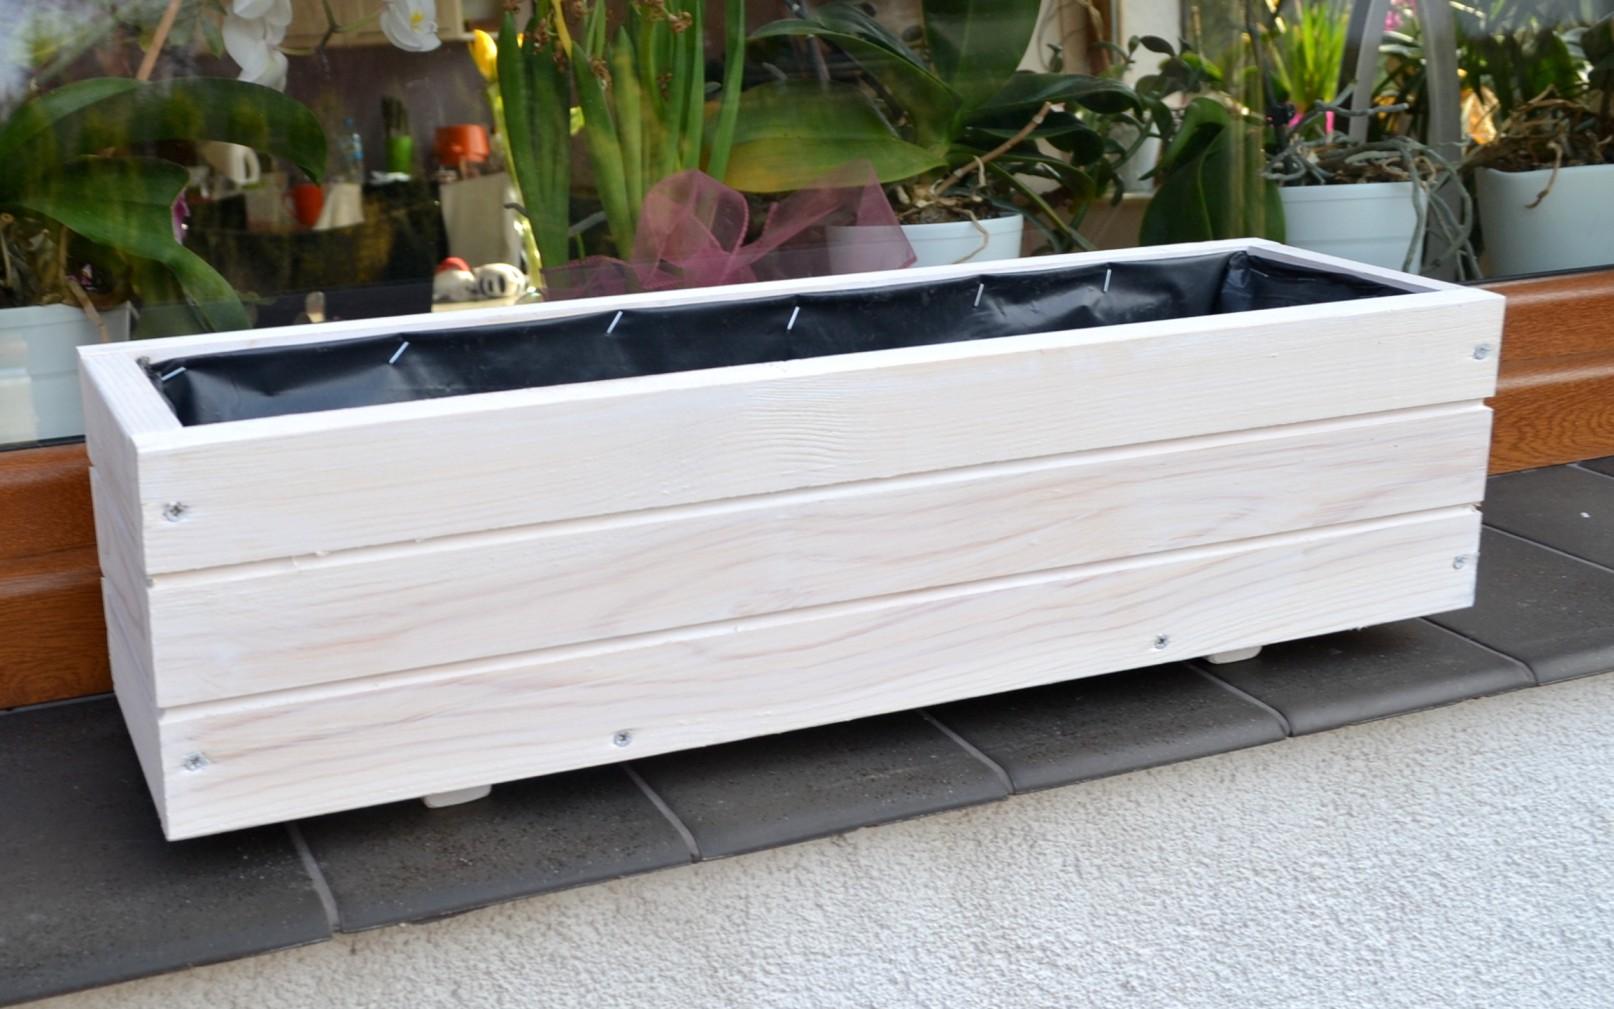 neu pflanzkübel holz d6 pflanzkasten 60 / 90 cm blumenkasten